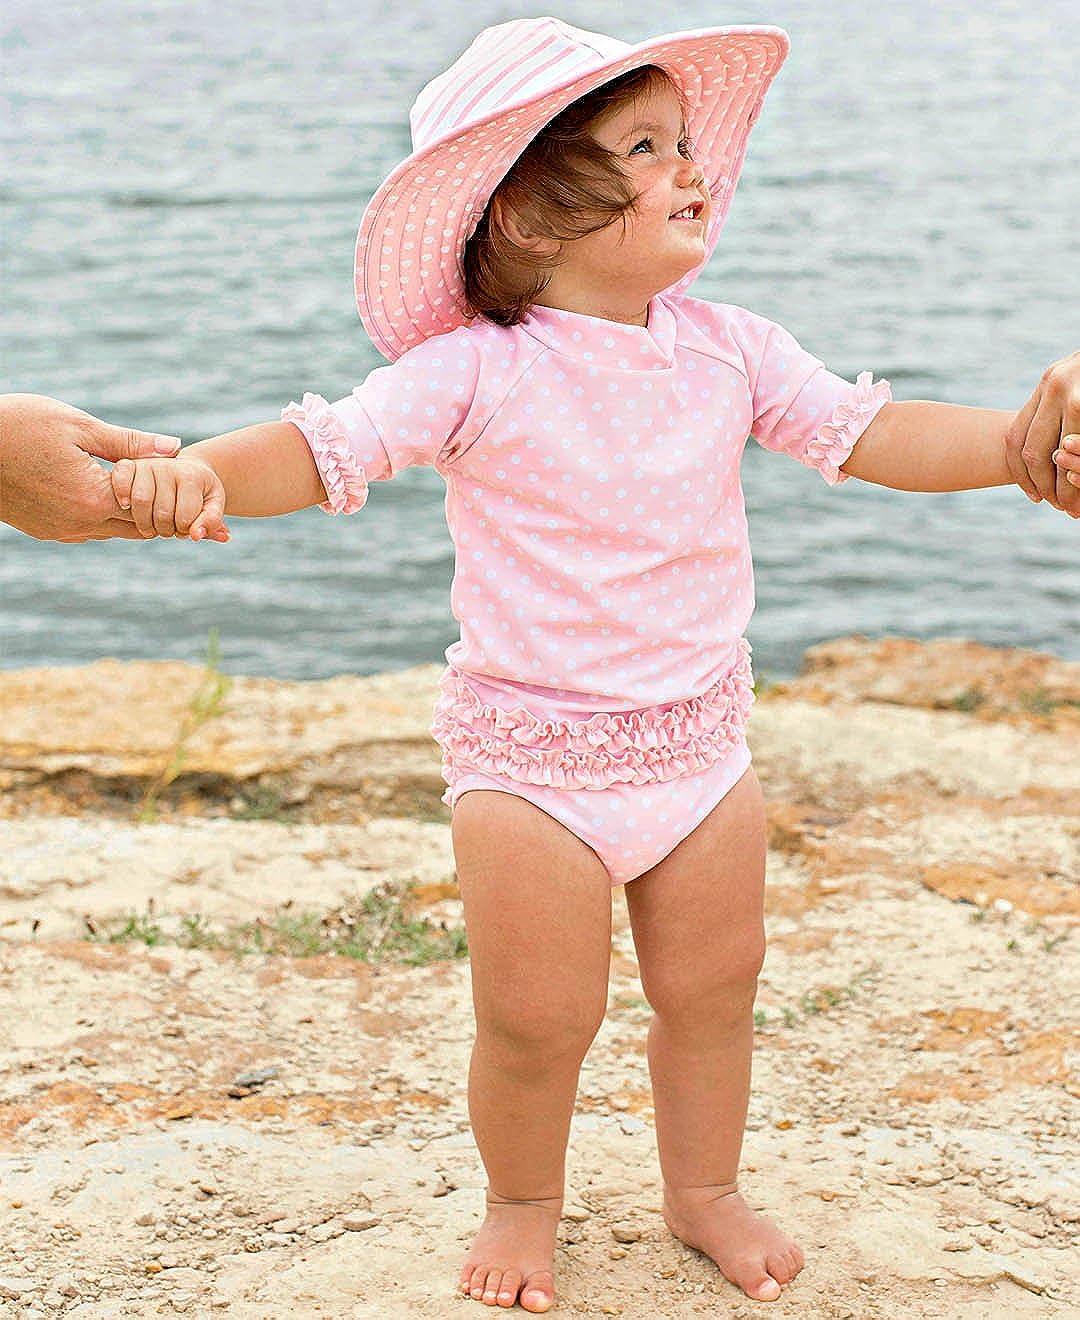 Sun Protection RGSYYXX-SSPK-SC-TDLR RuffleButts Little Girls Rash Guard 2-Piece Swimsuit Set Polka Dot Bikini with UPF 50